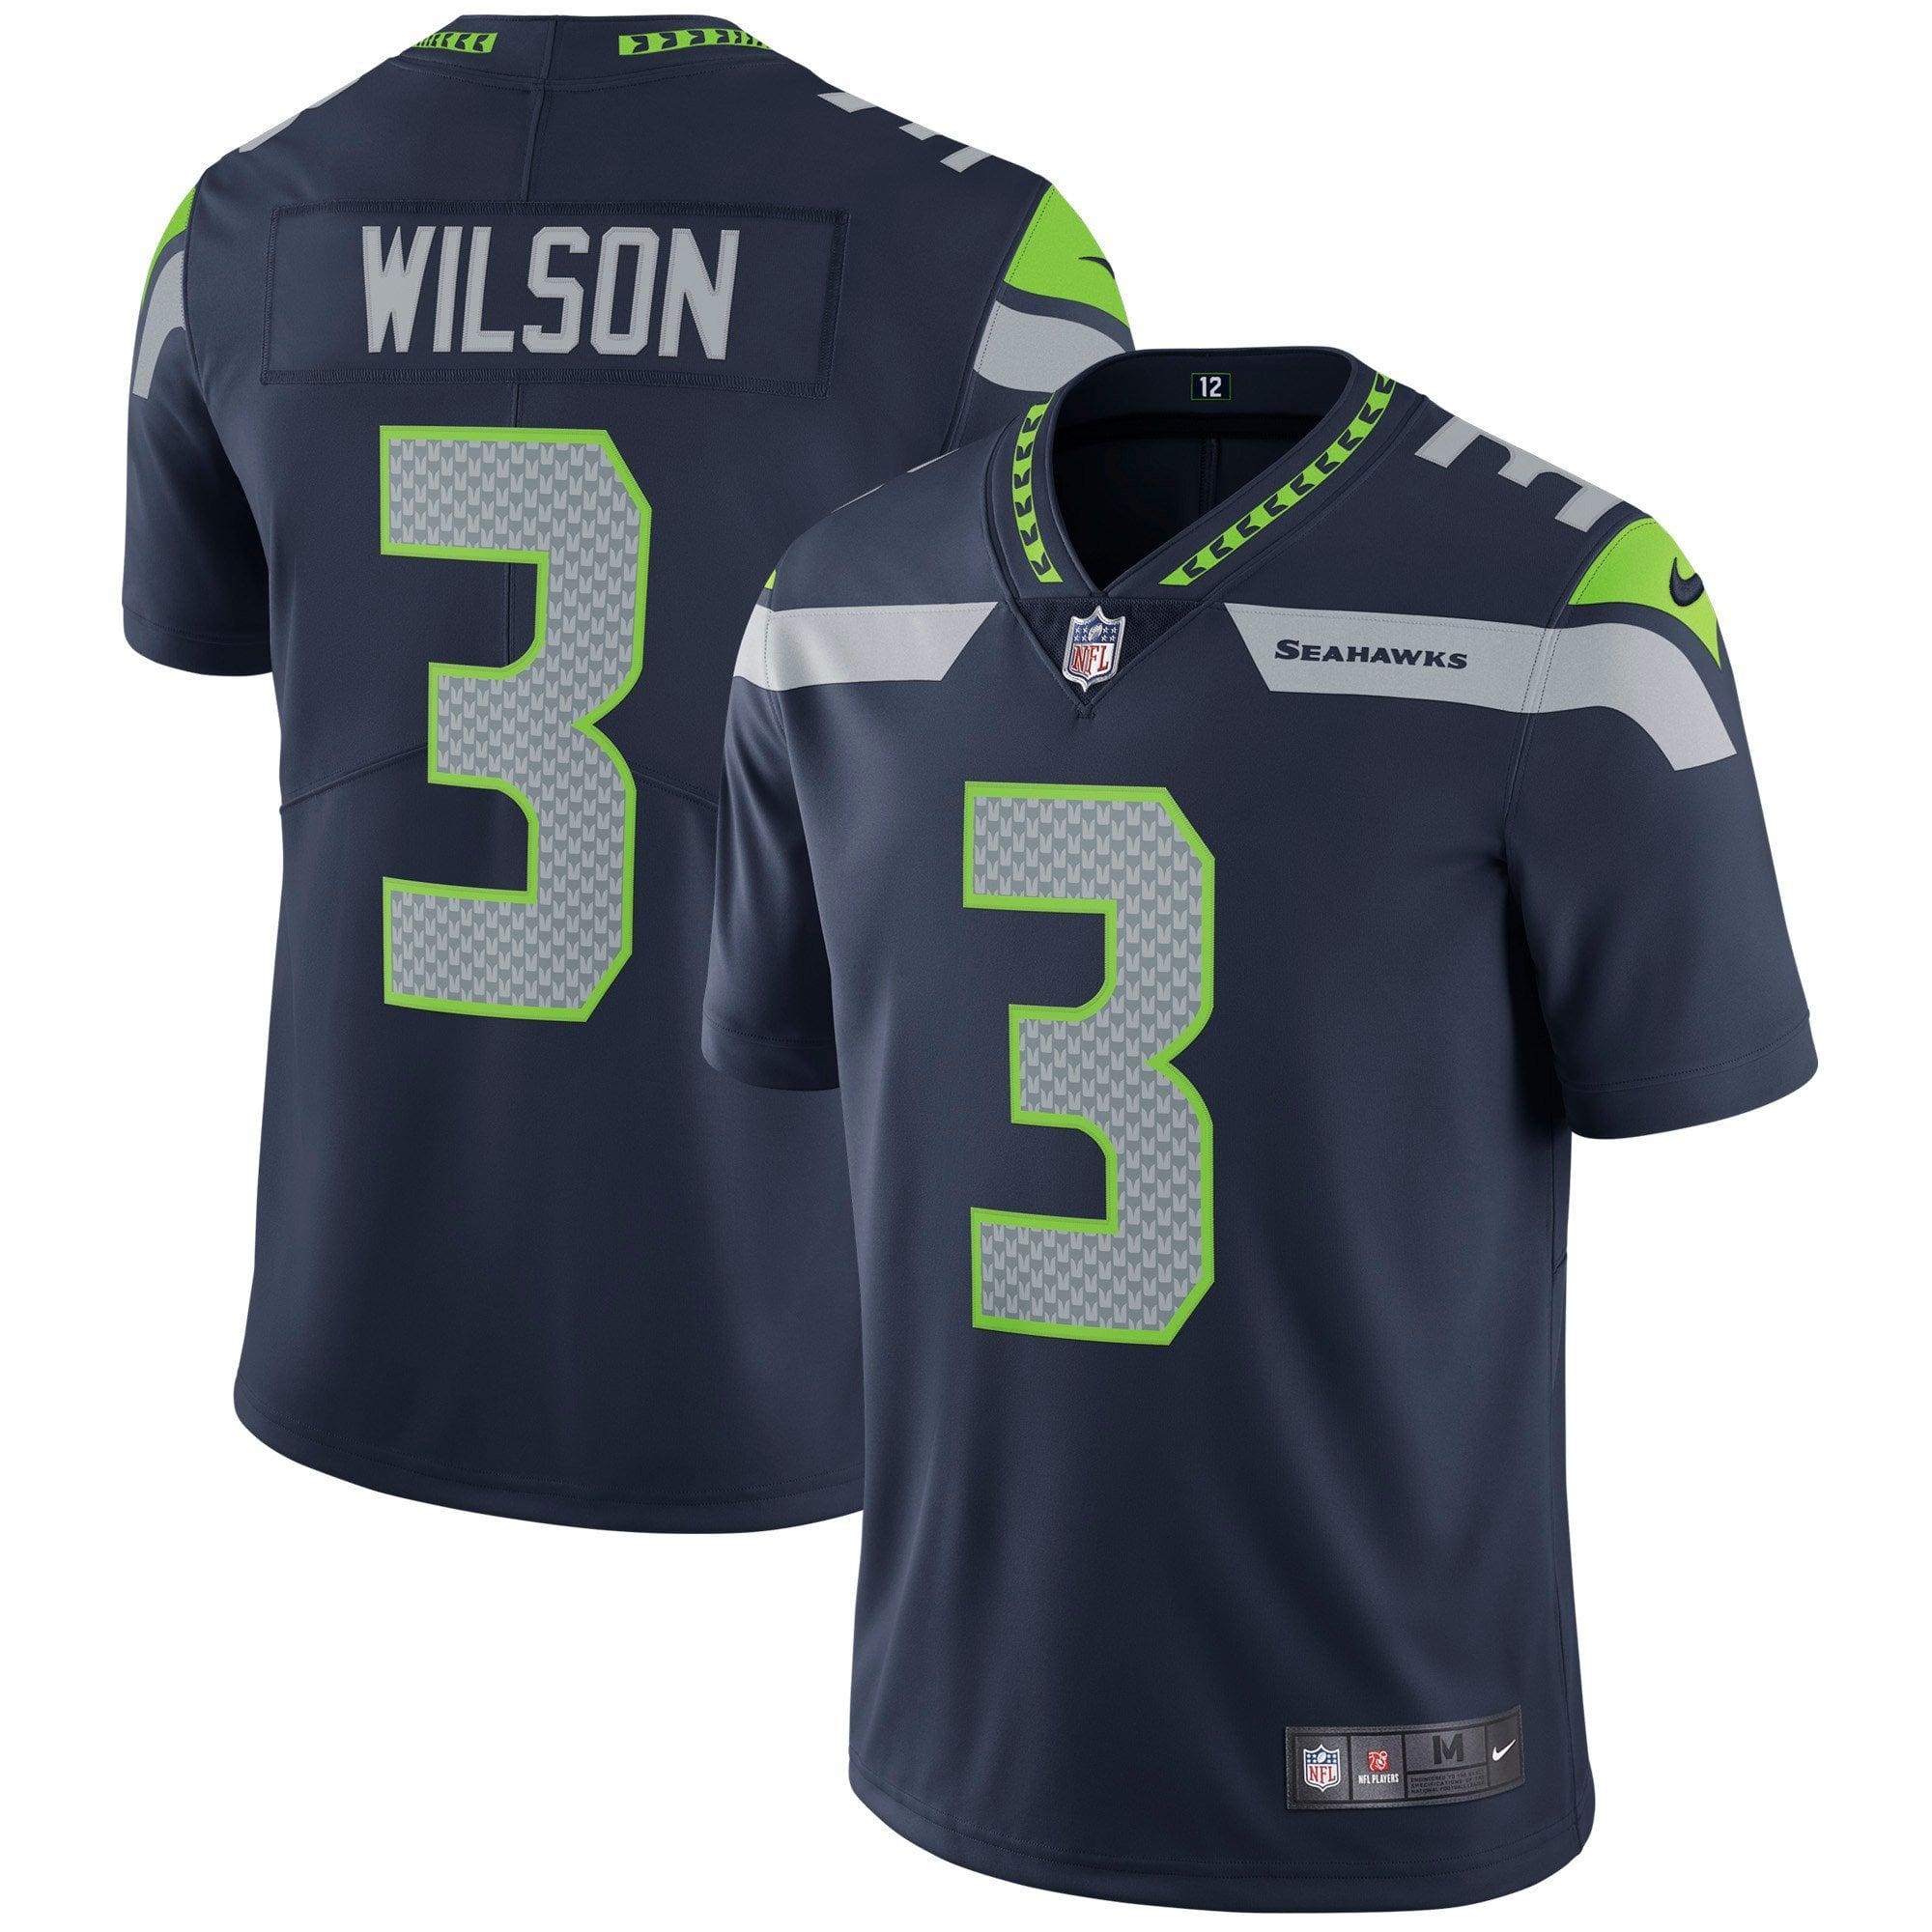 Nike NFL Seattle Seahawks Home Vapor